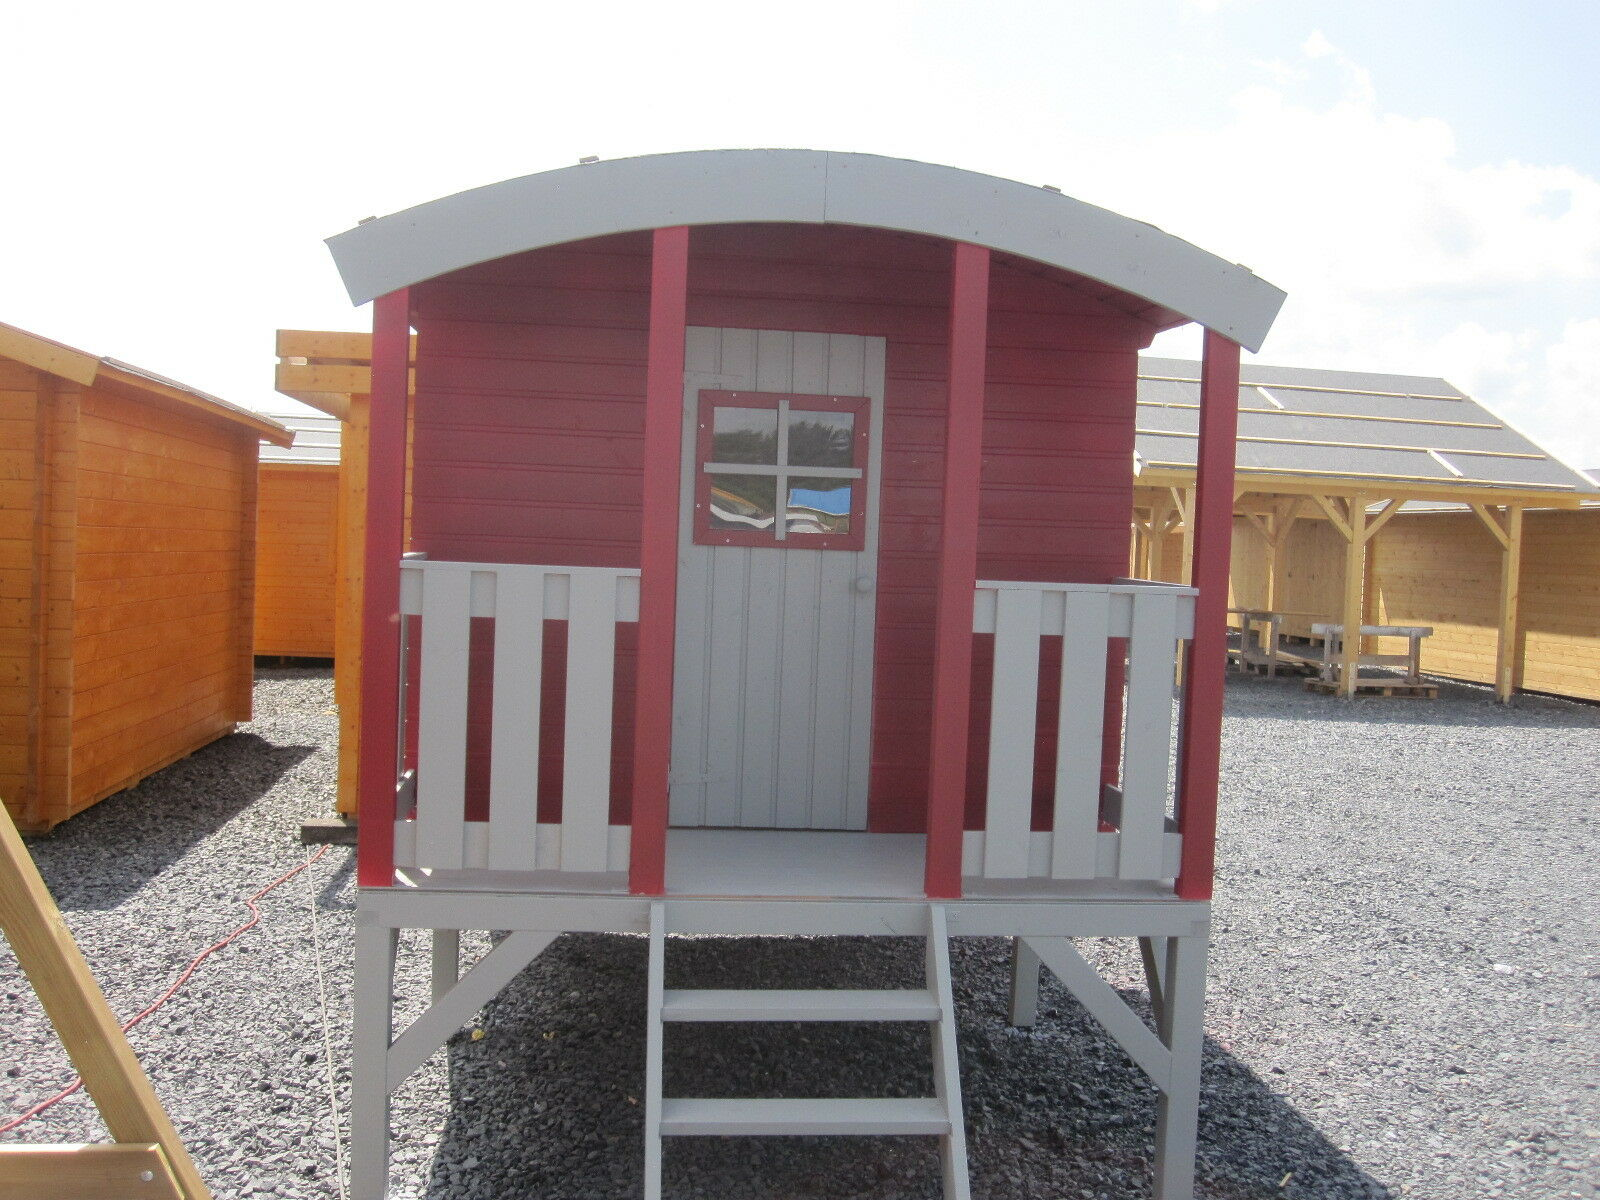 Kinderhaus tobi runddach bauwagen zirkuswagen gartenhaus - Bauwagen als gartenhaus ...